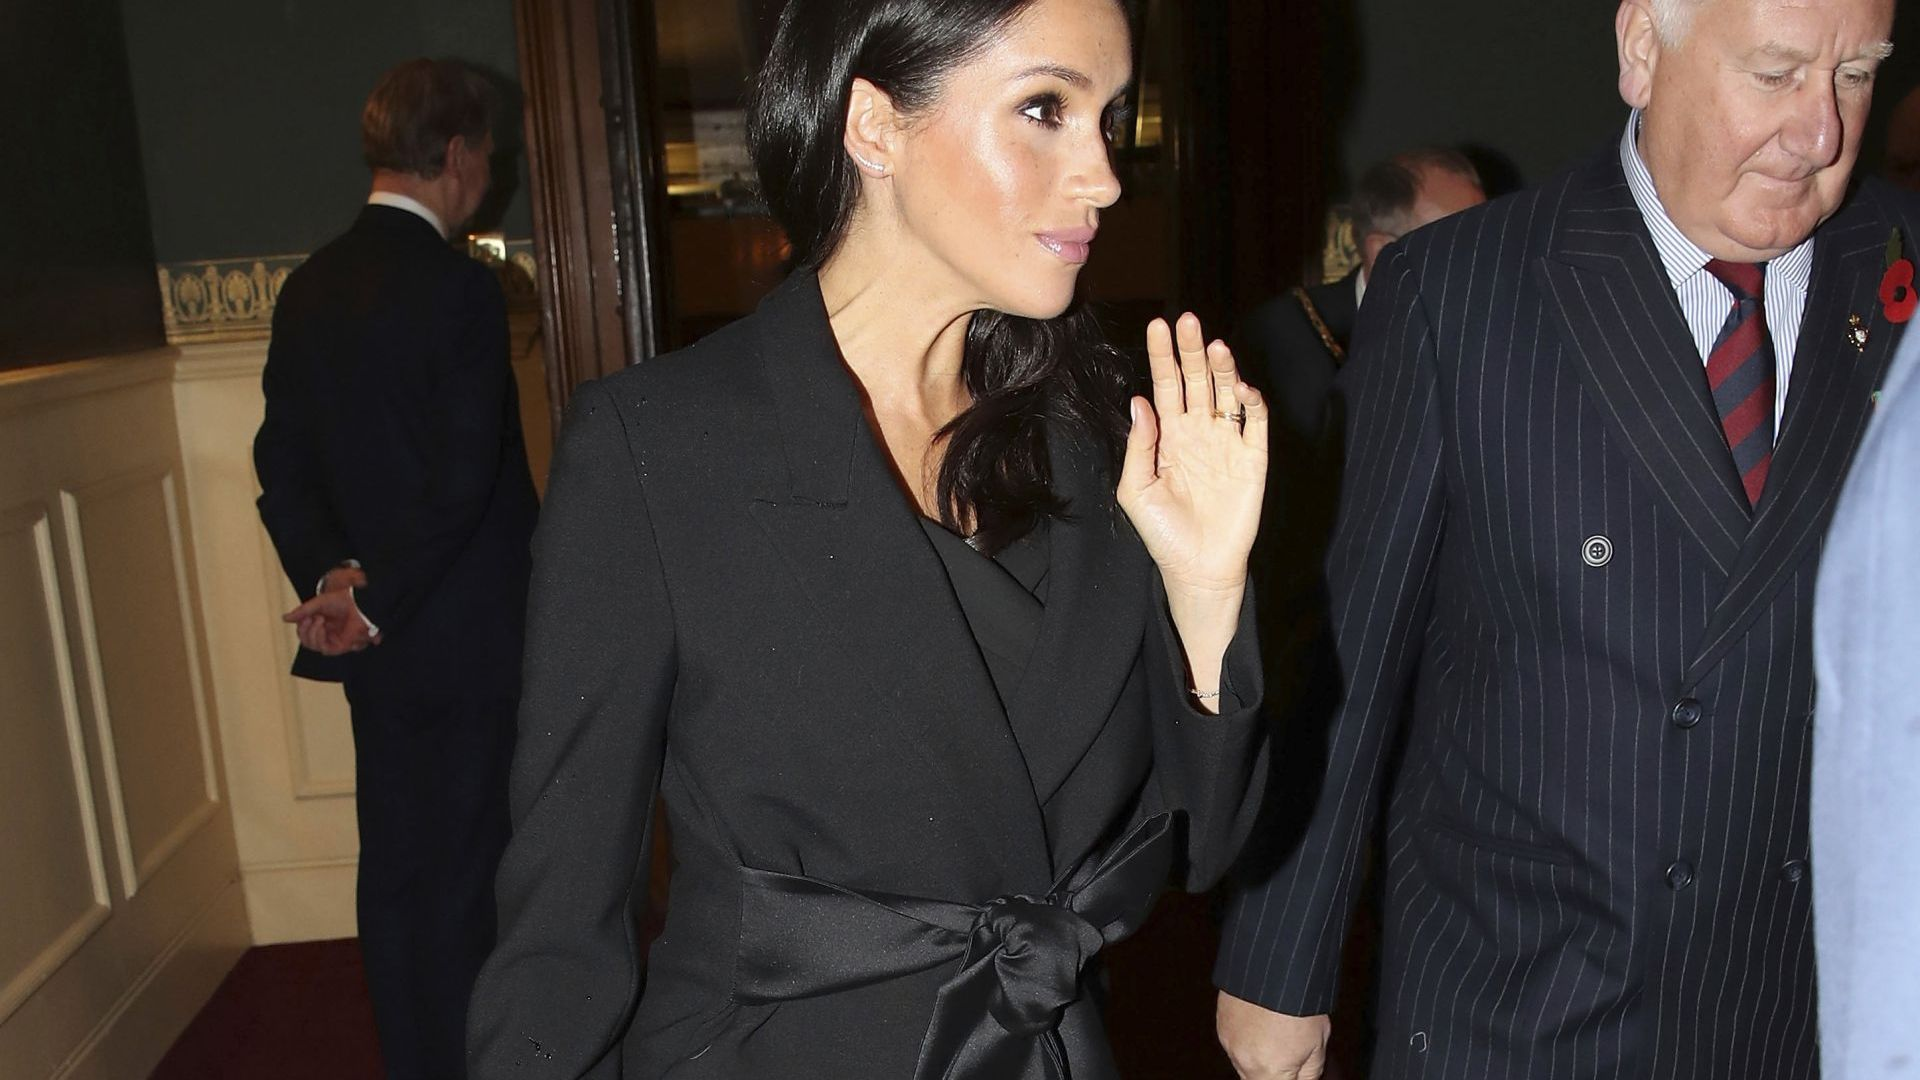 Меган и Кейт с перфектен моден избор в черно